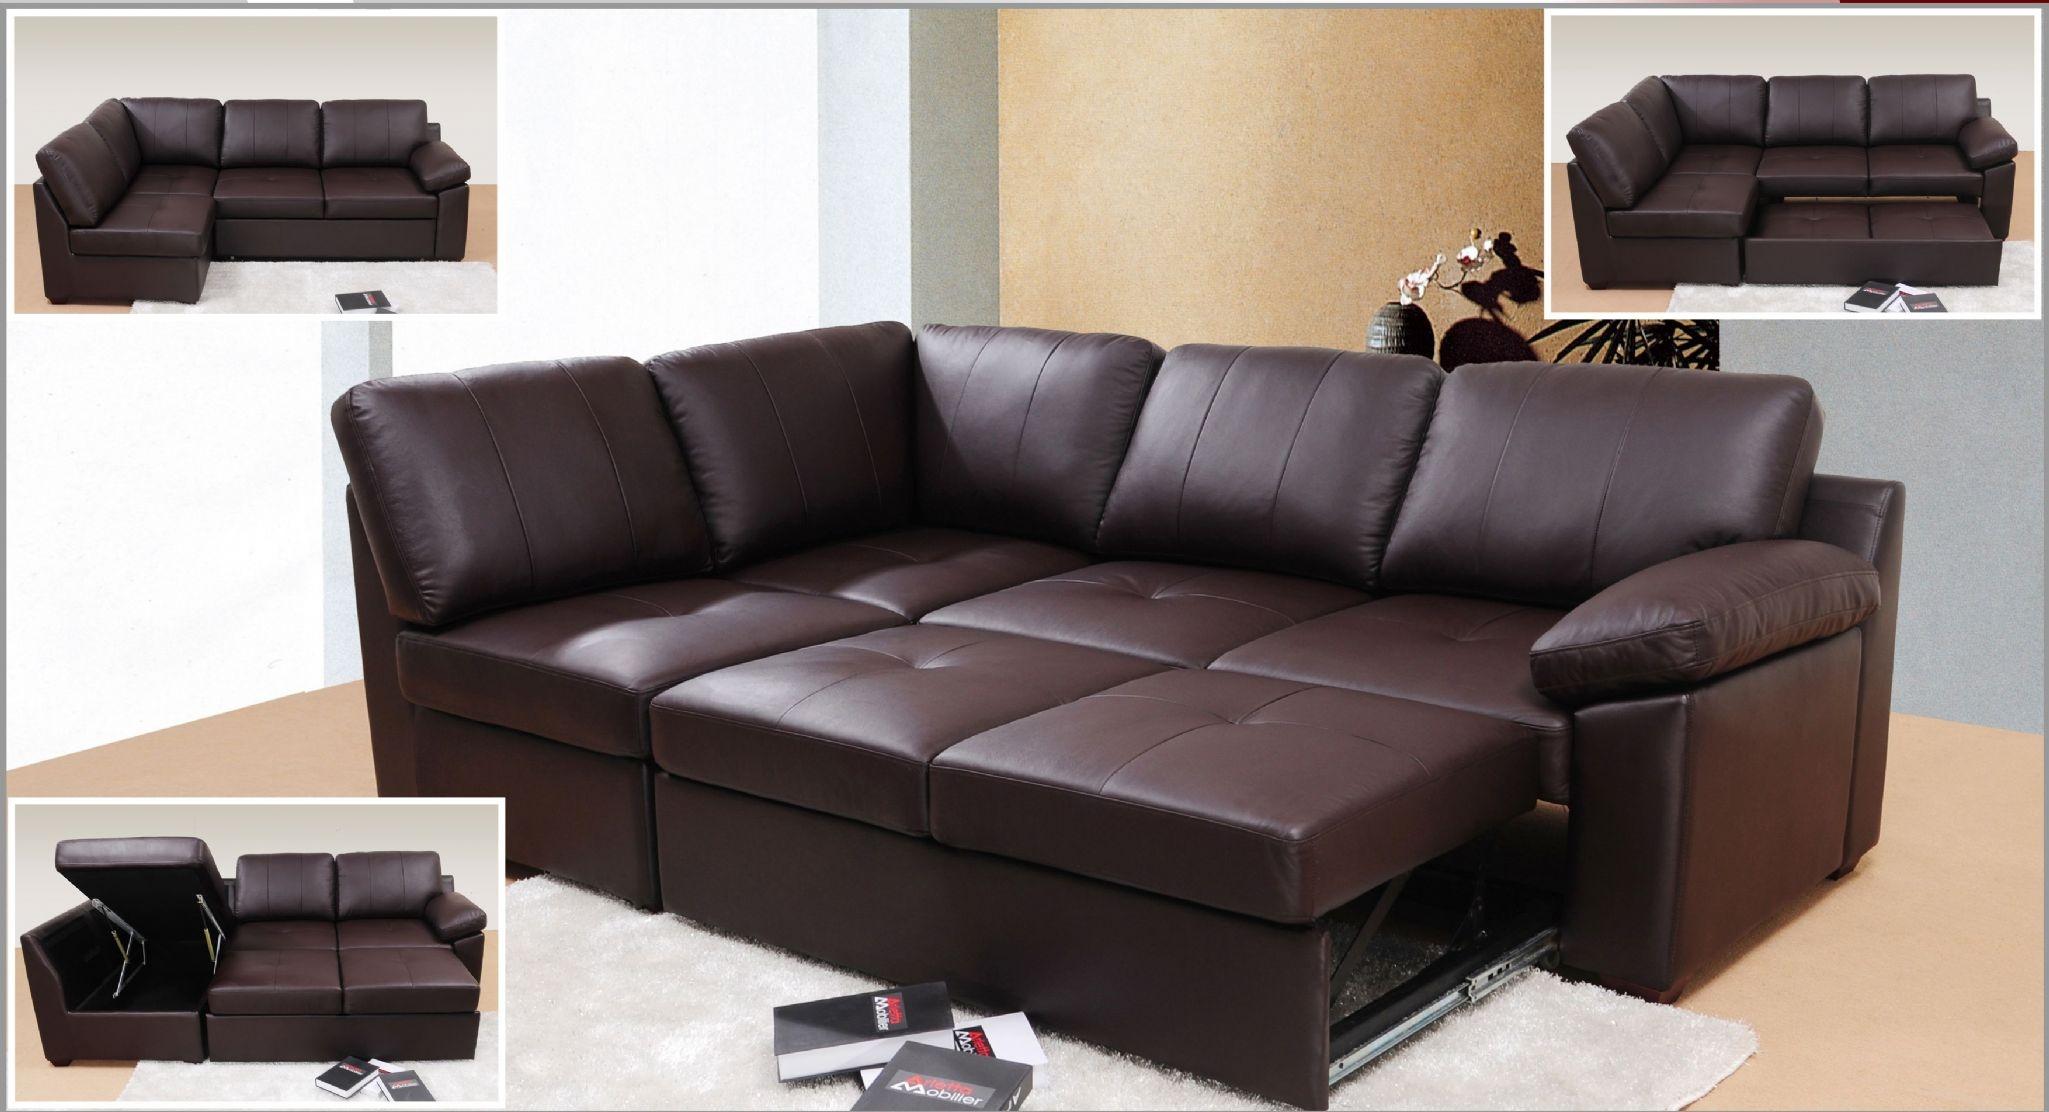 Sofa Bed Leather Corner Tehranmix Decoration In Leather Corner Sofa Bed (Image 13 of 15)